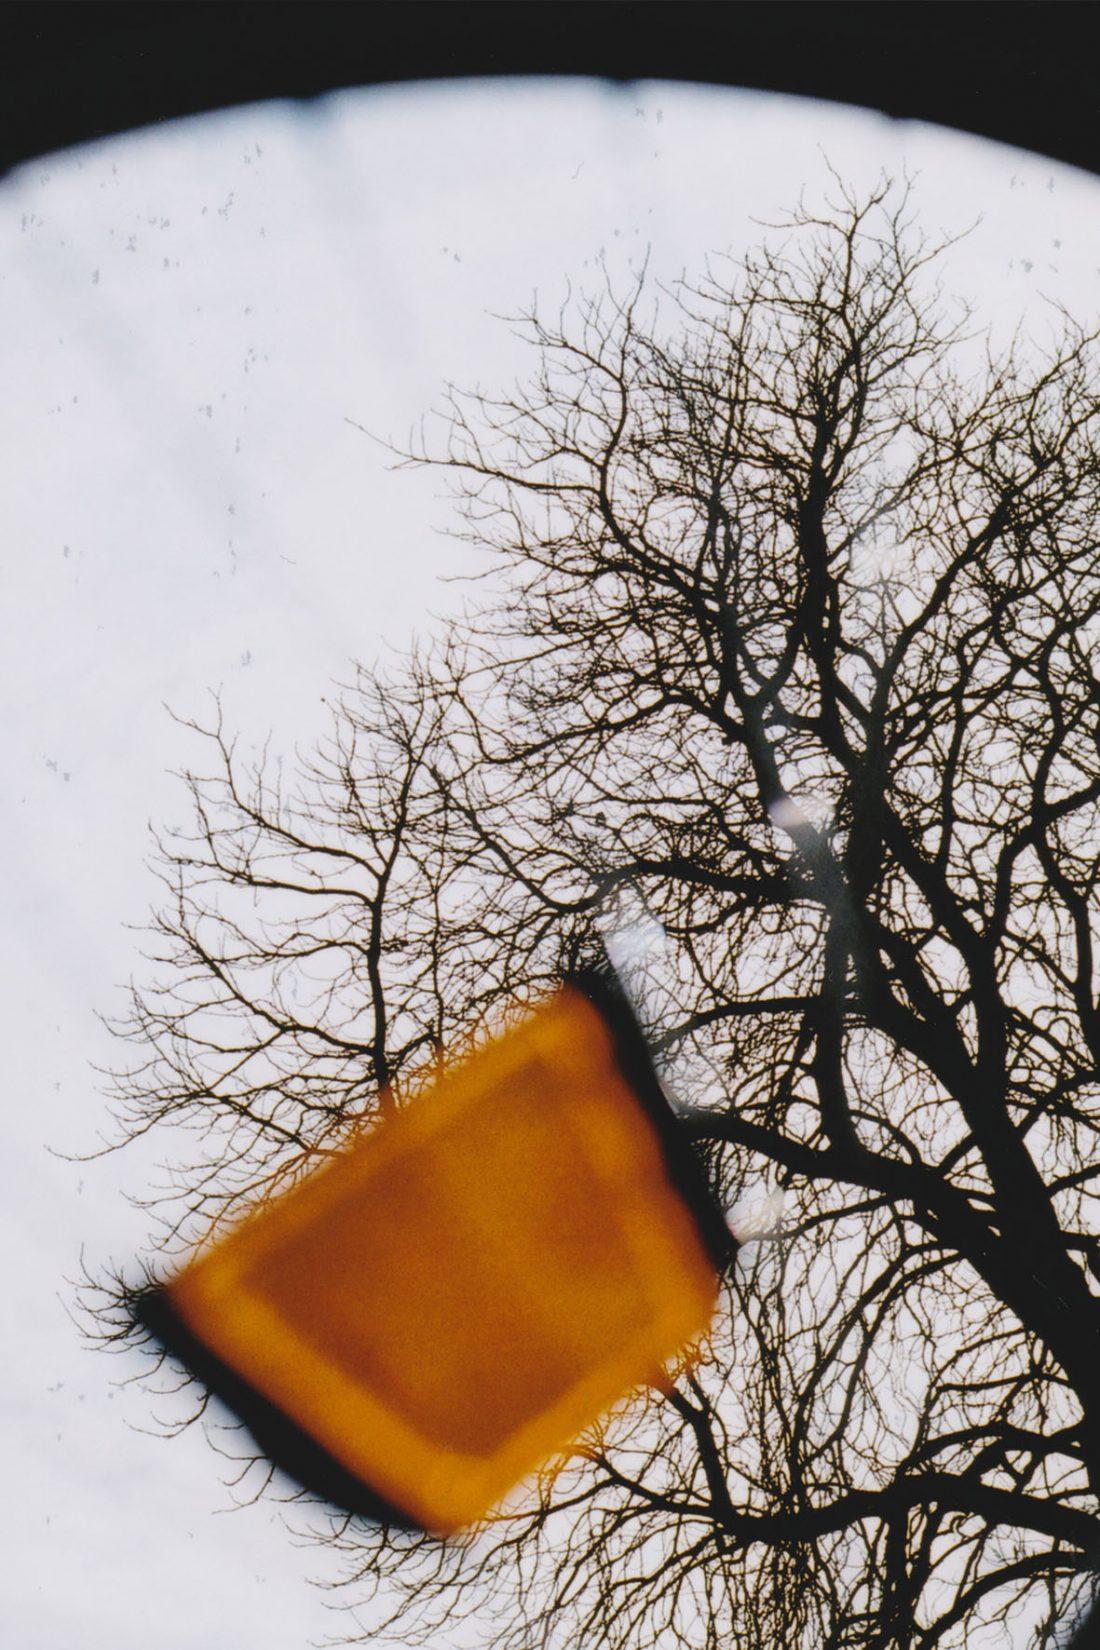 Analoge Fotografie - Mein erster Film